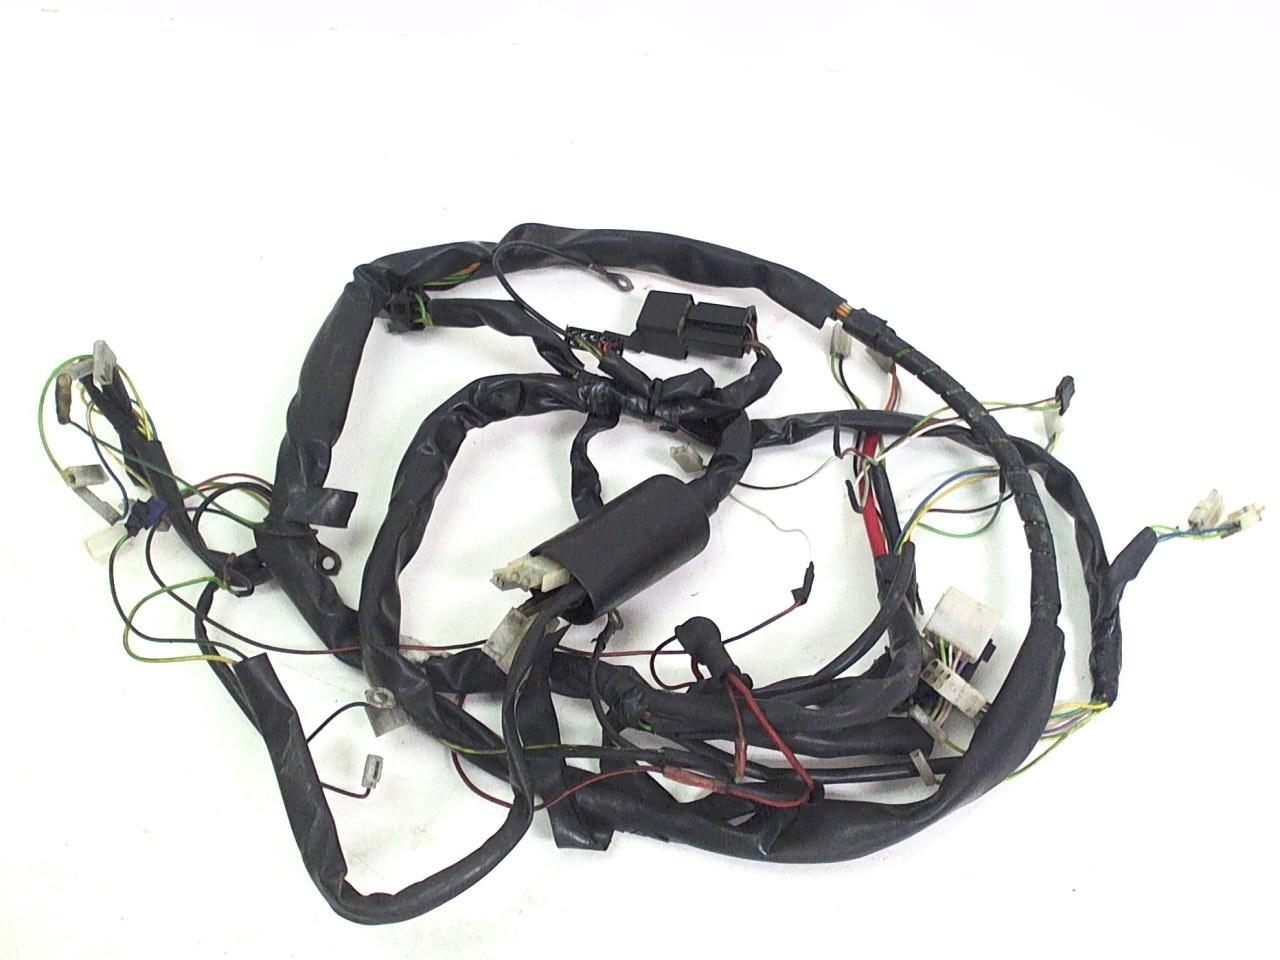 derbi senda 50cc wiring diagram 2005 dodge durango infinity stereo 2002